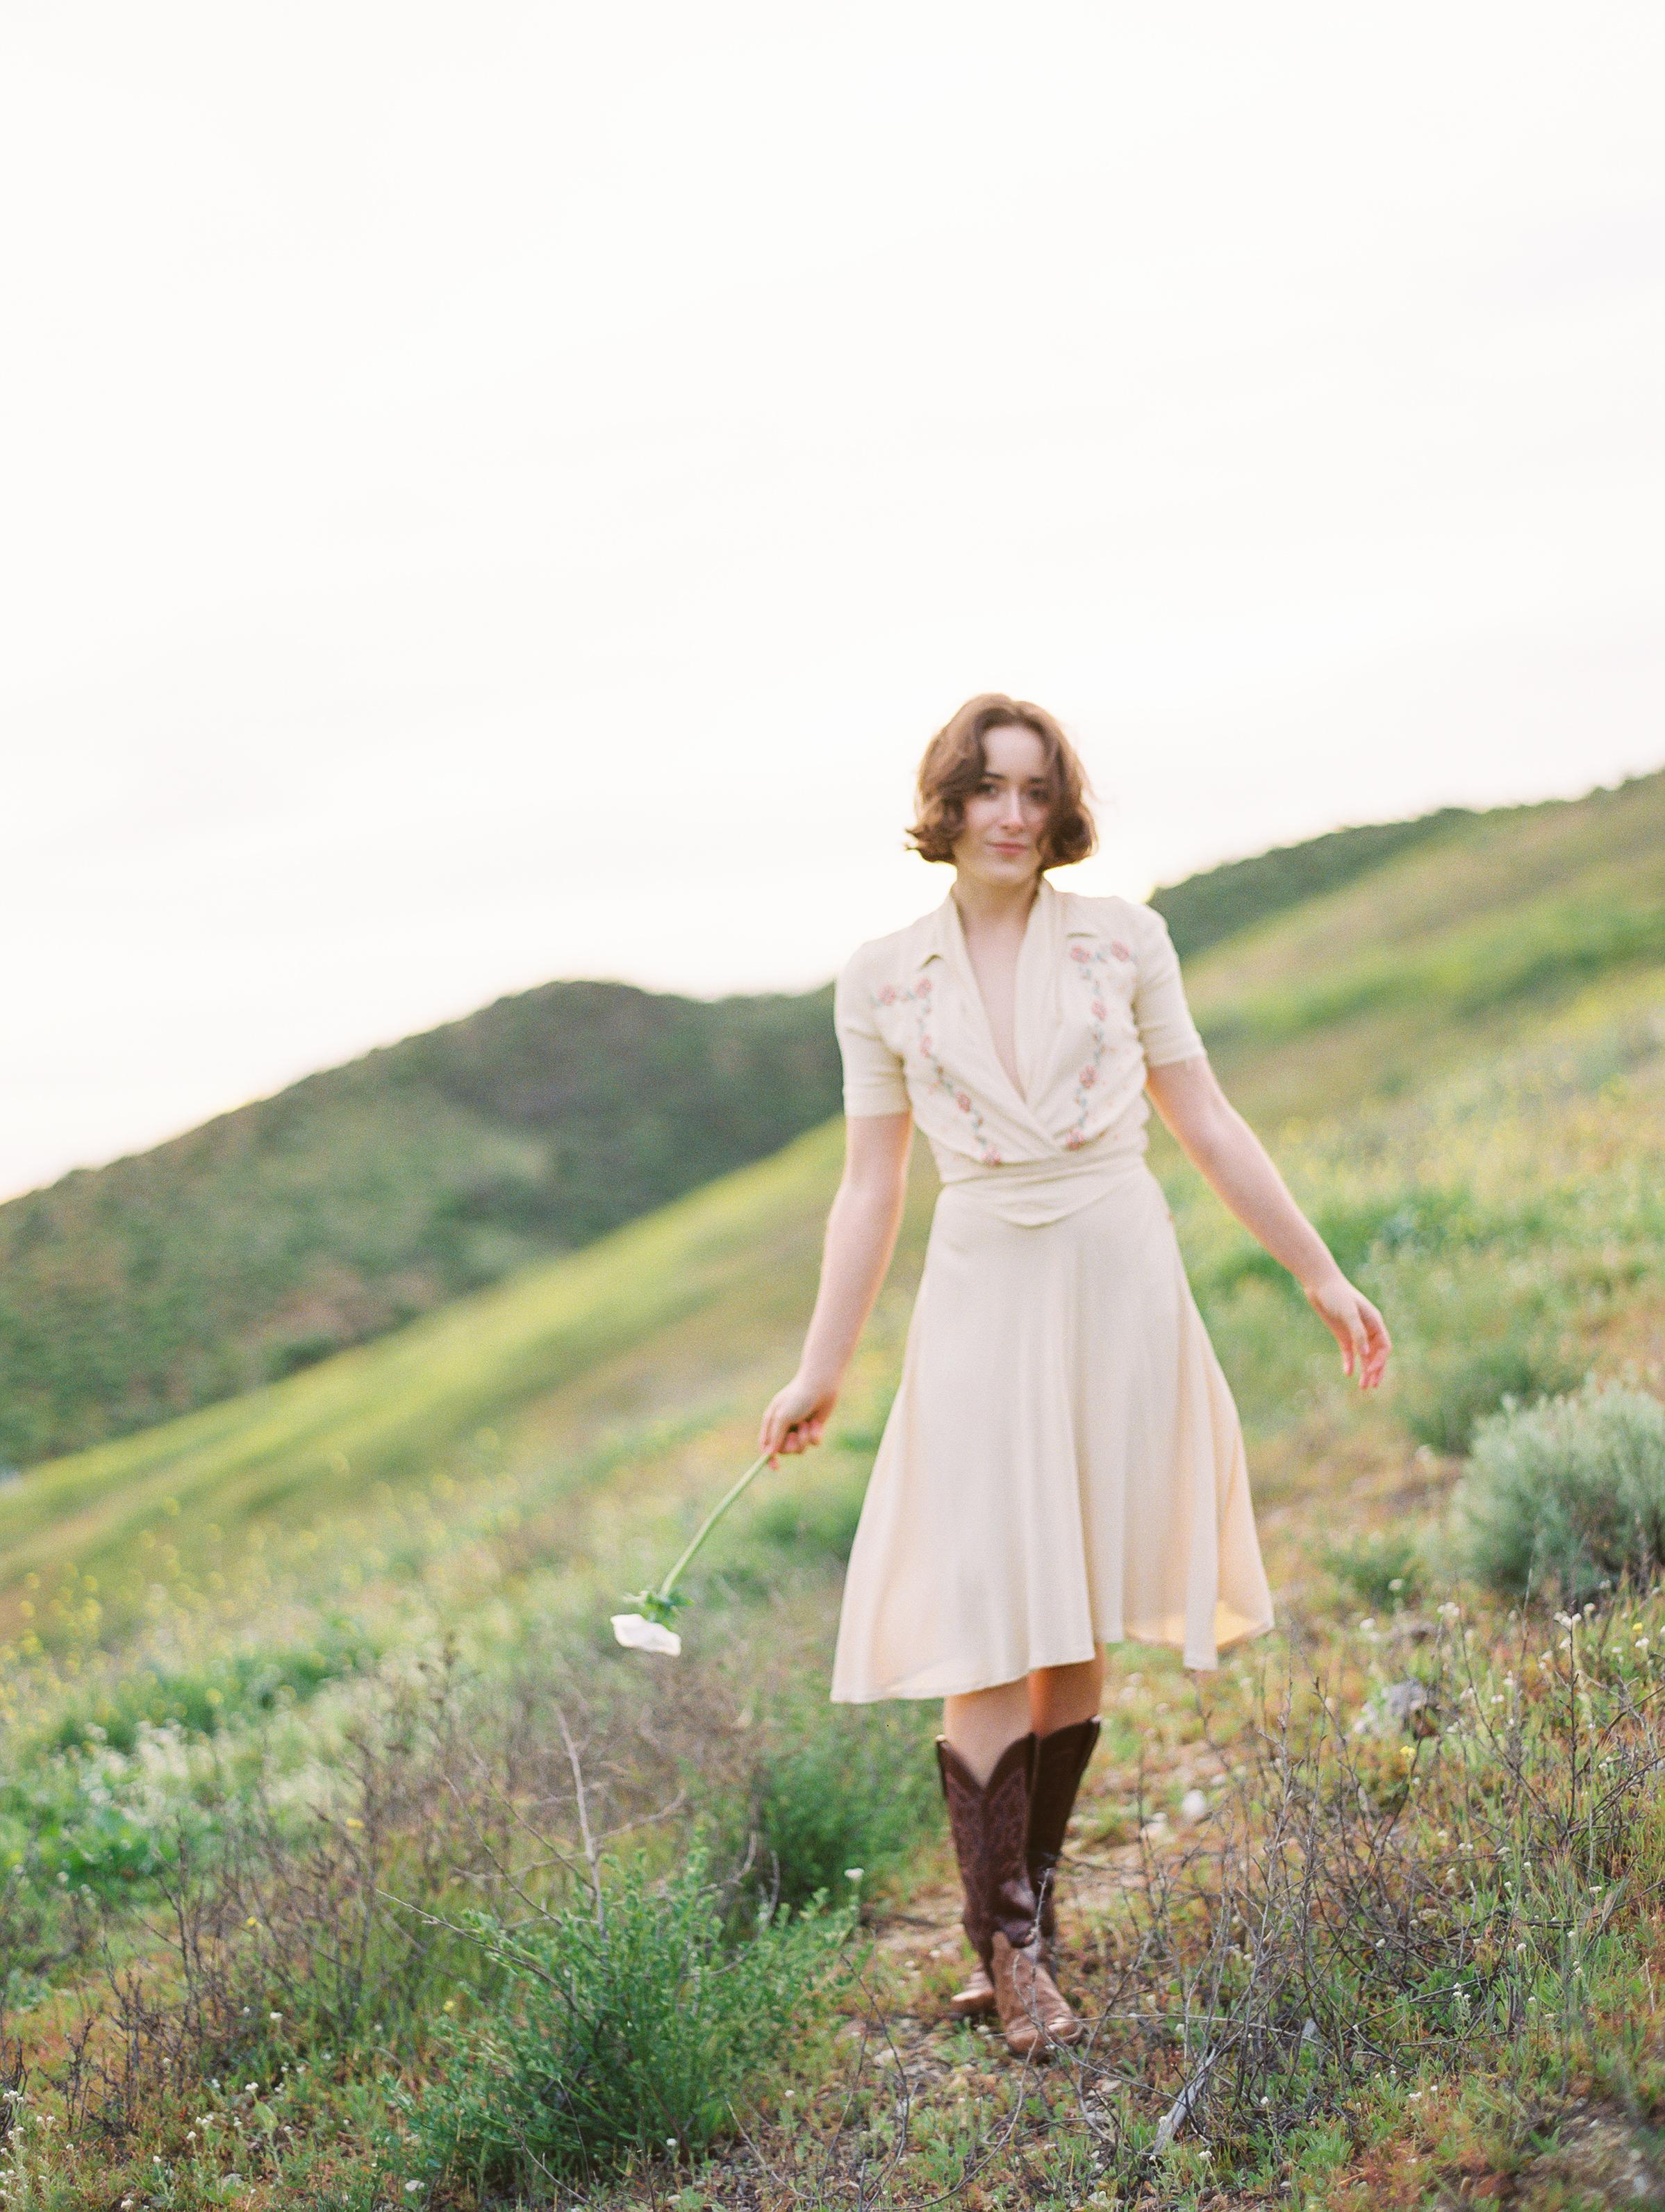 StephanieFishbeinPhotography-001-5.jpg